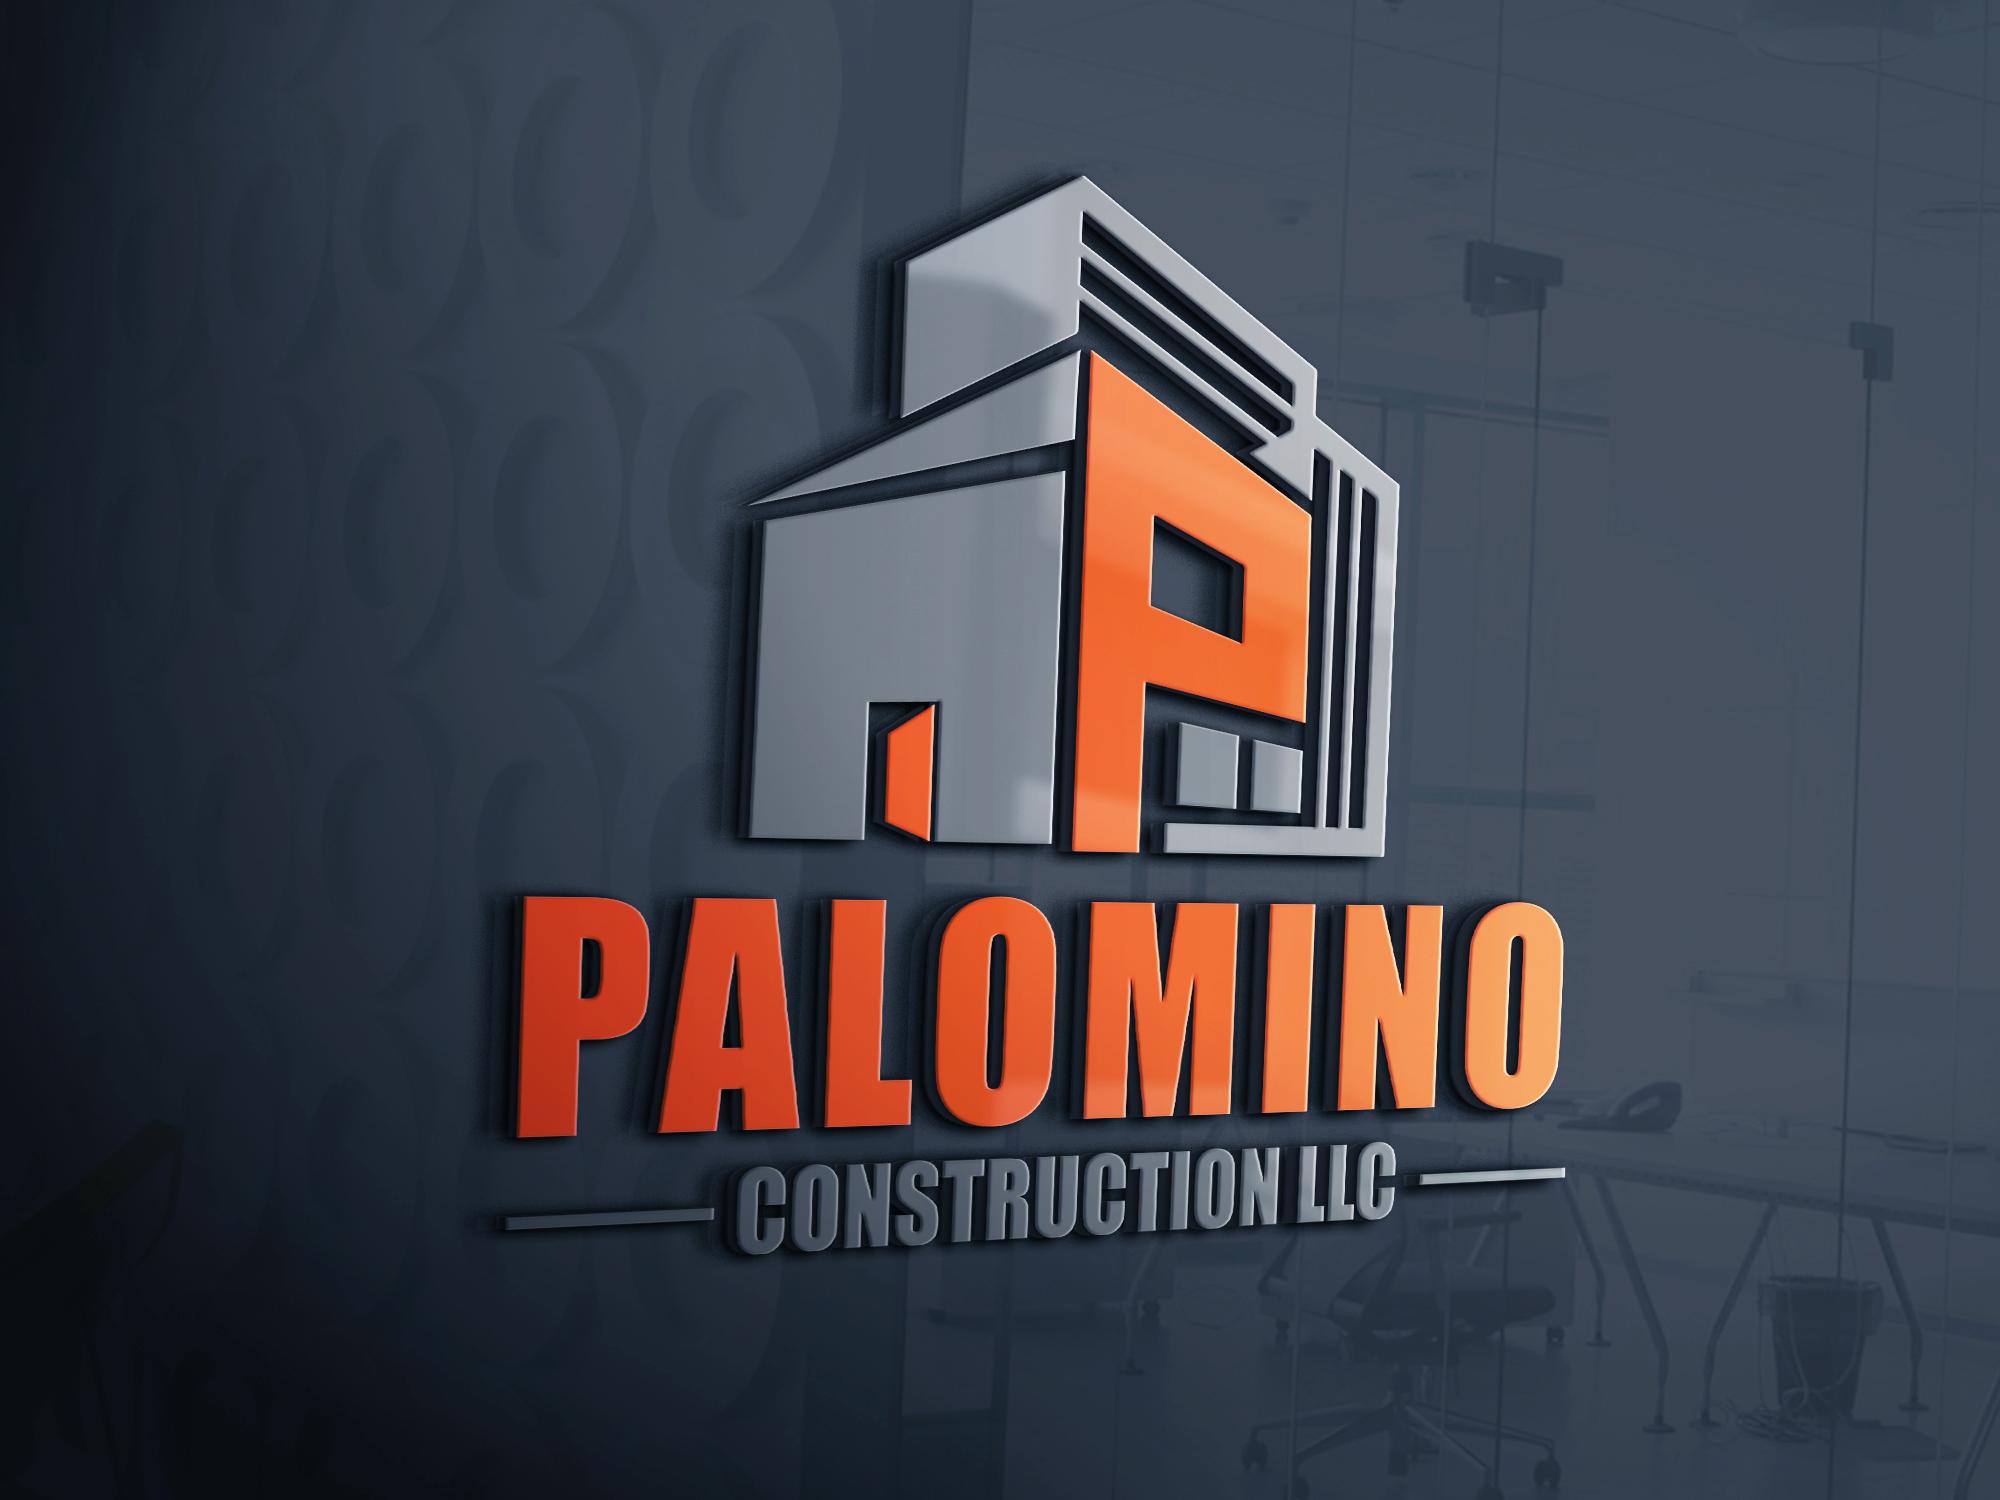 Palomino Construction Llc